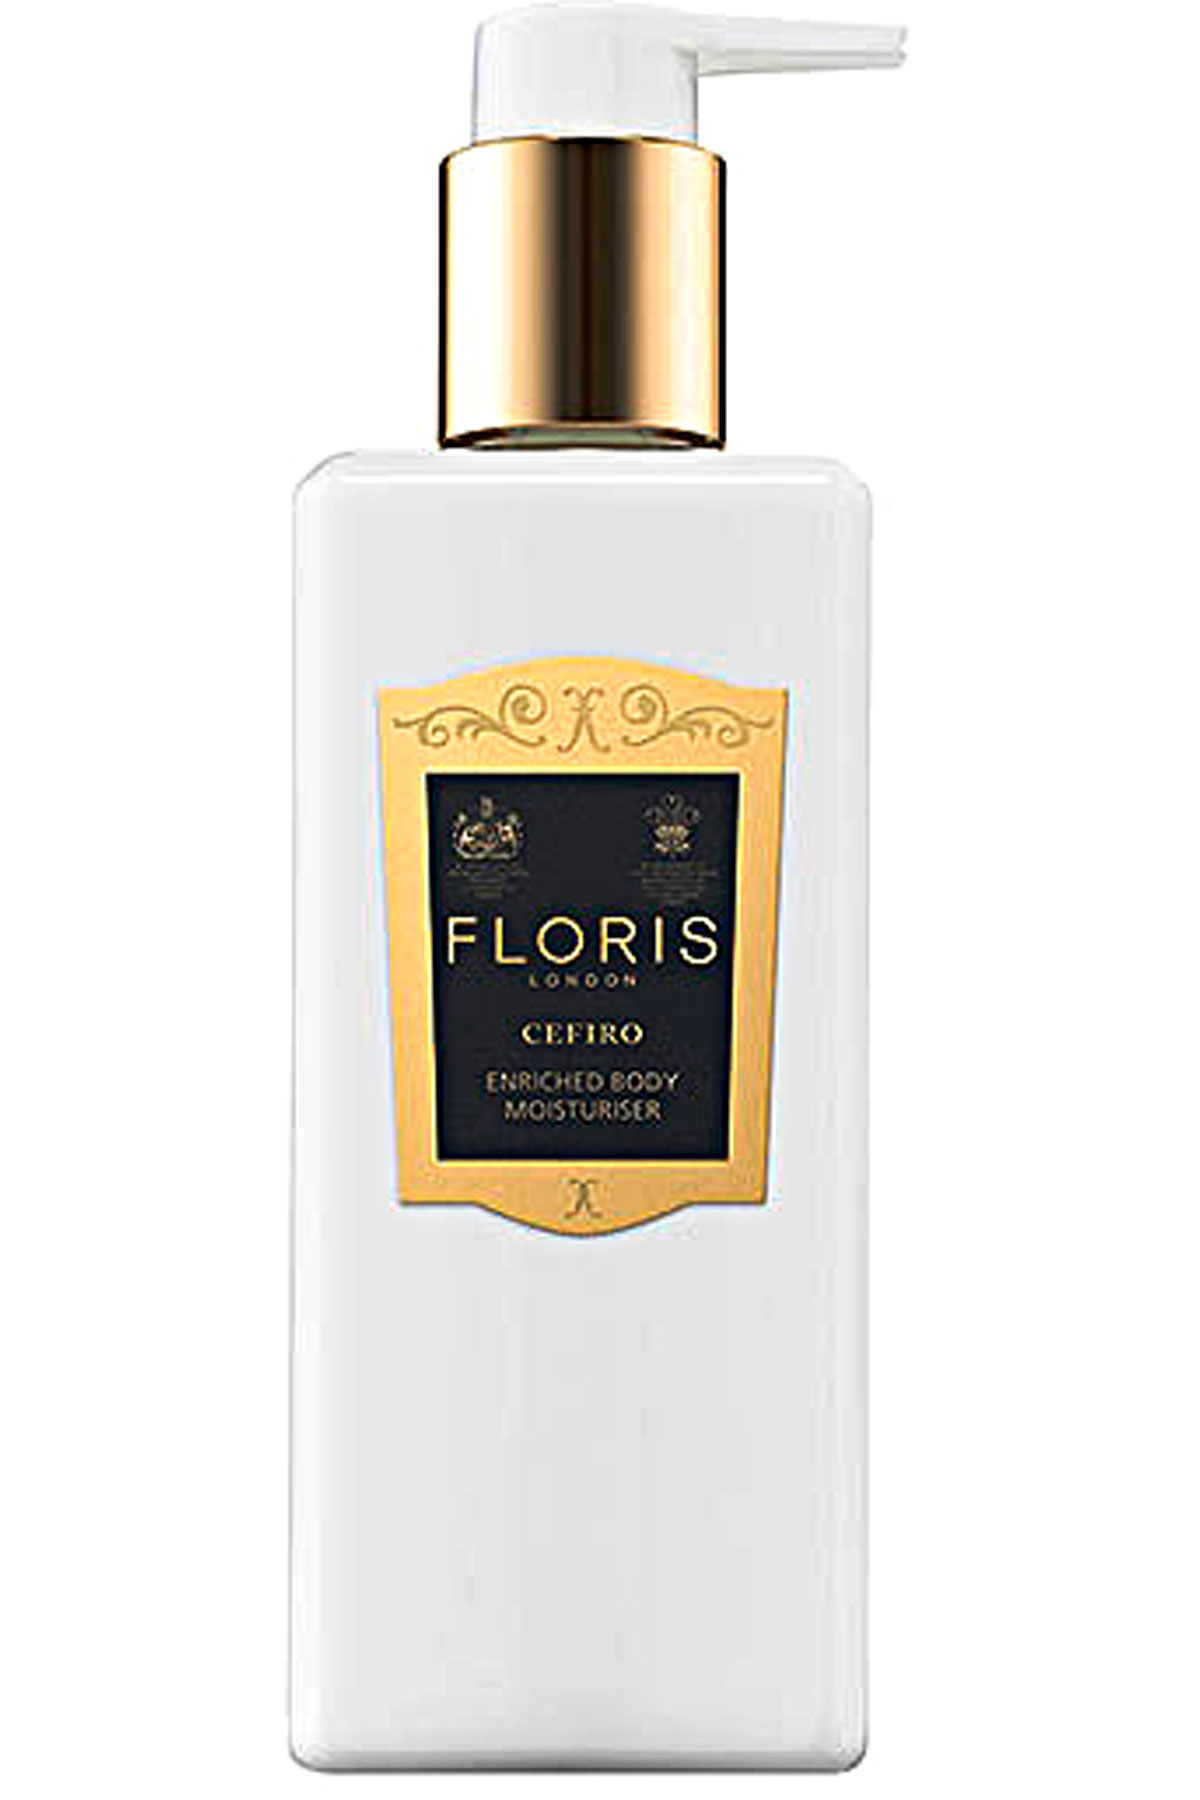 Floris London Beauty for Women On Sale, Cefiro - Body Moisturiser - 250 Ml, 2019, 250 ml